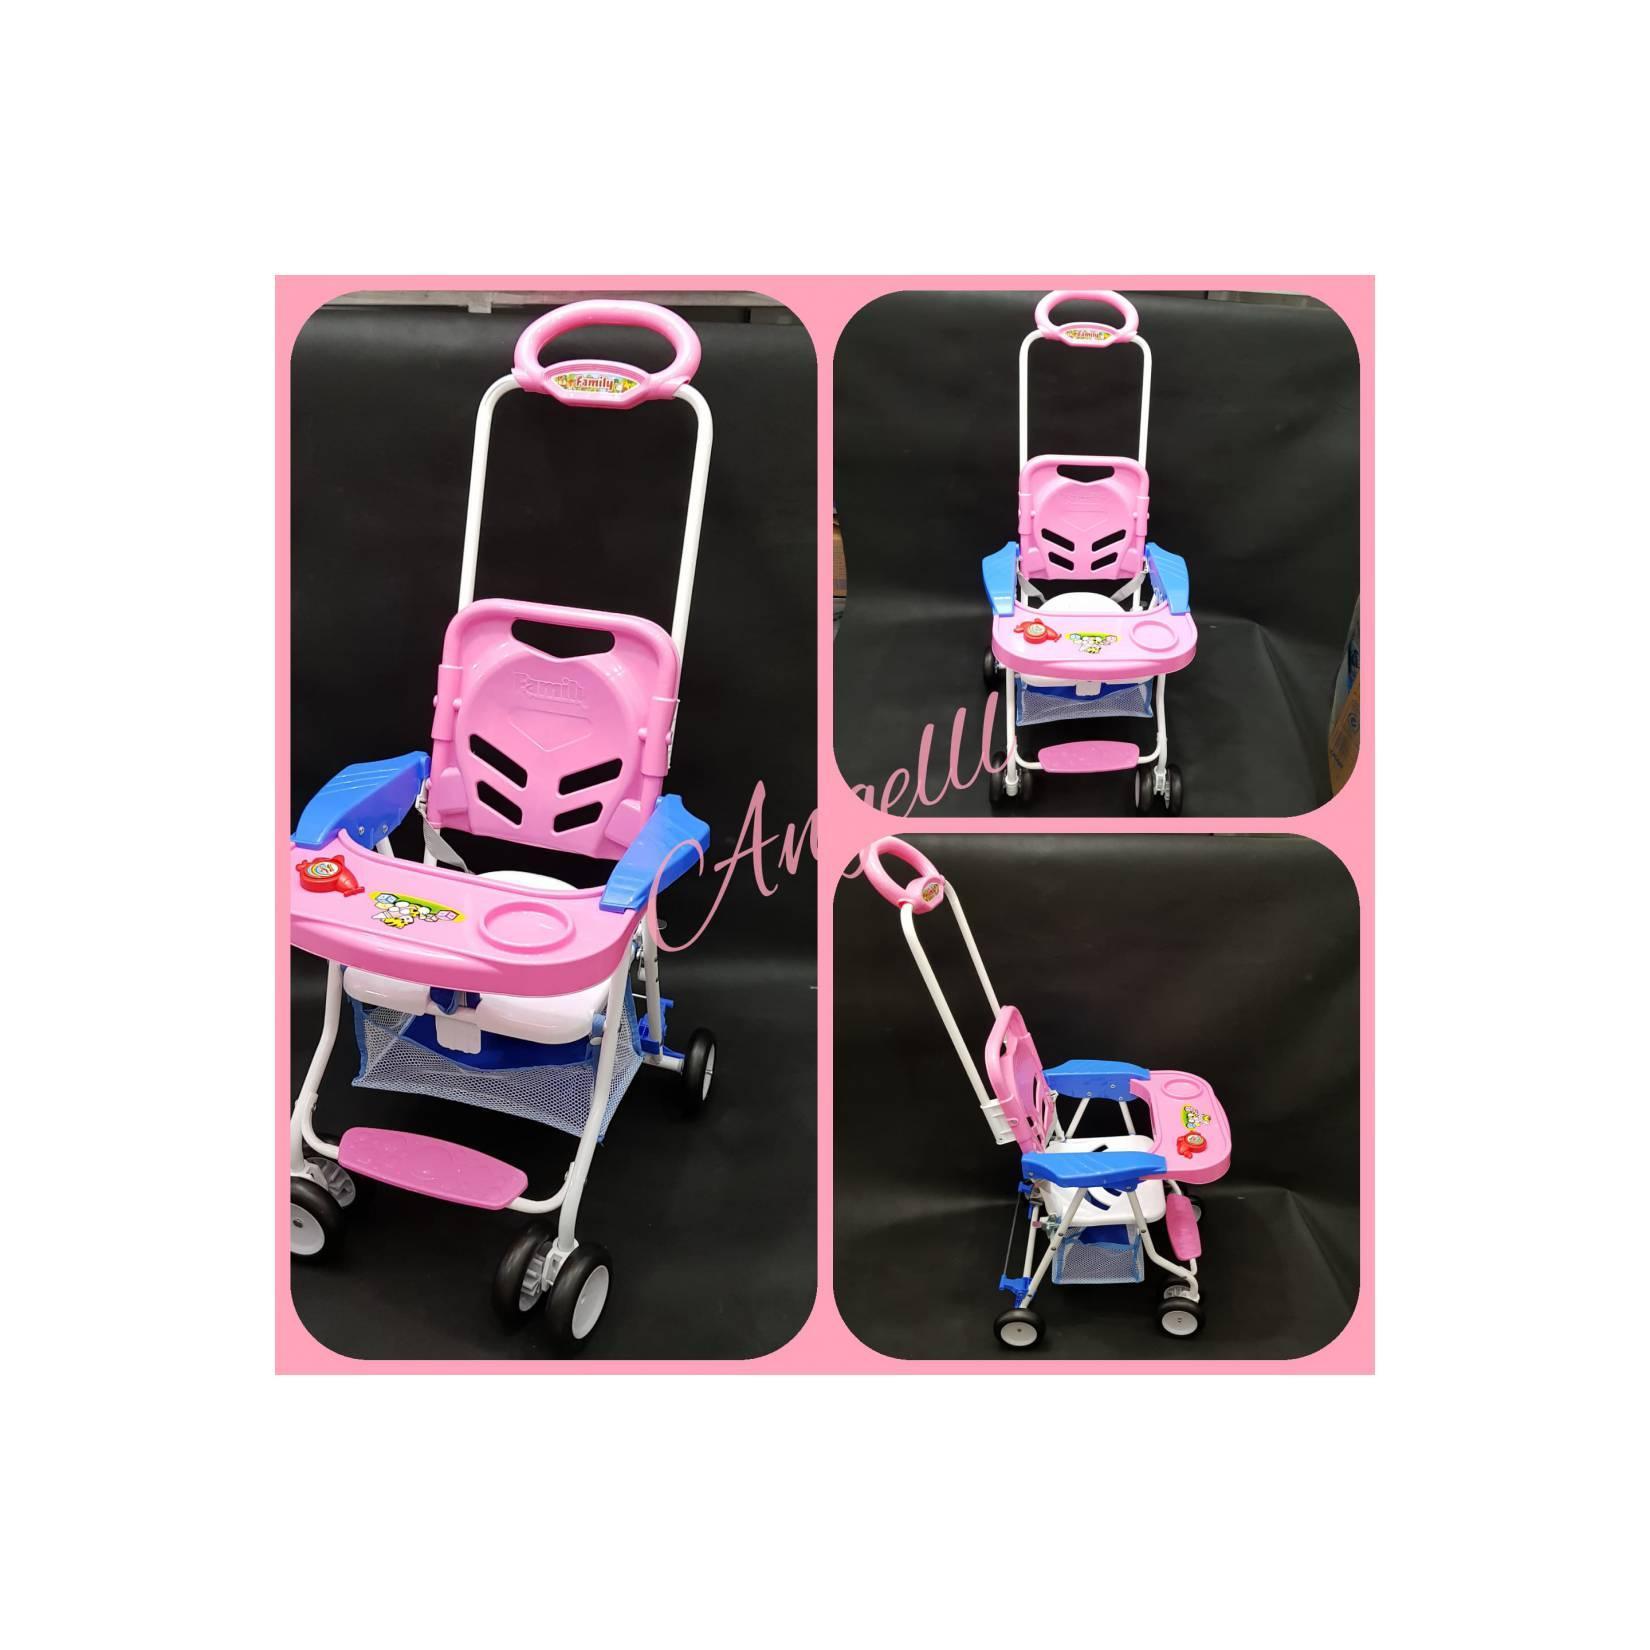 Jual Kursi Makan murah Bayi Chair Stroller Family fc 8288 ready